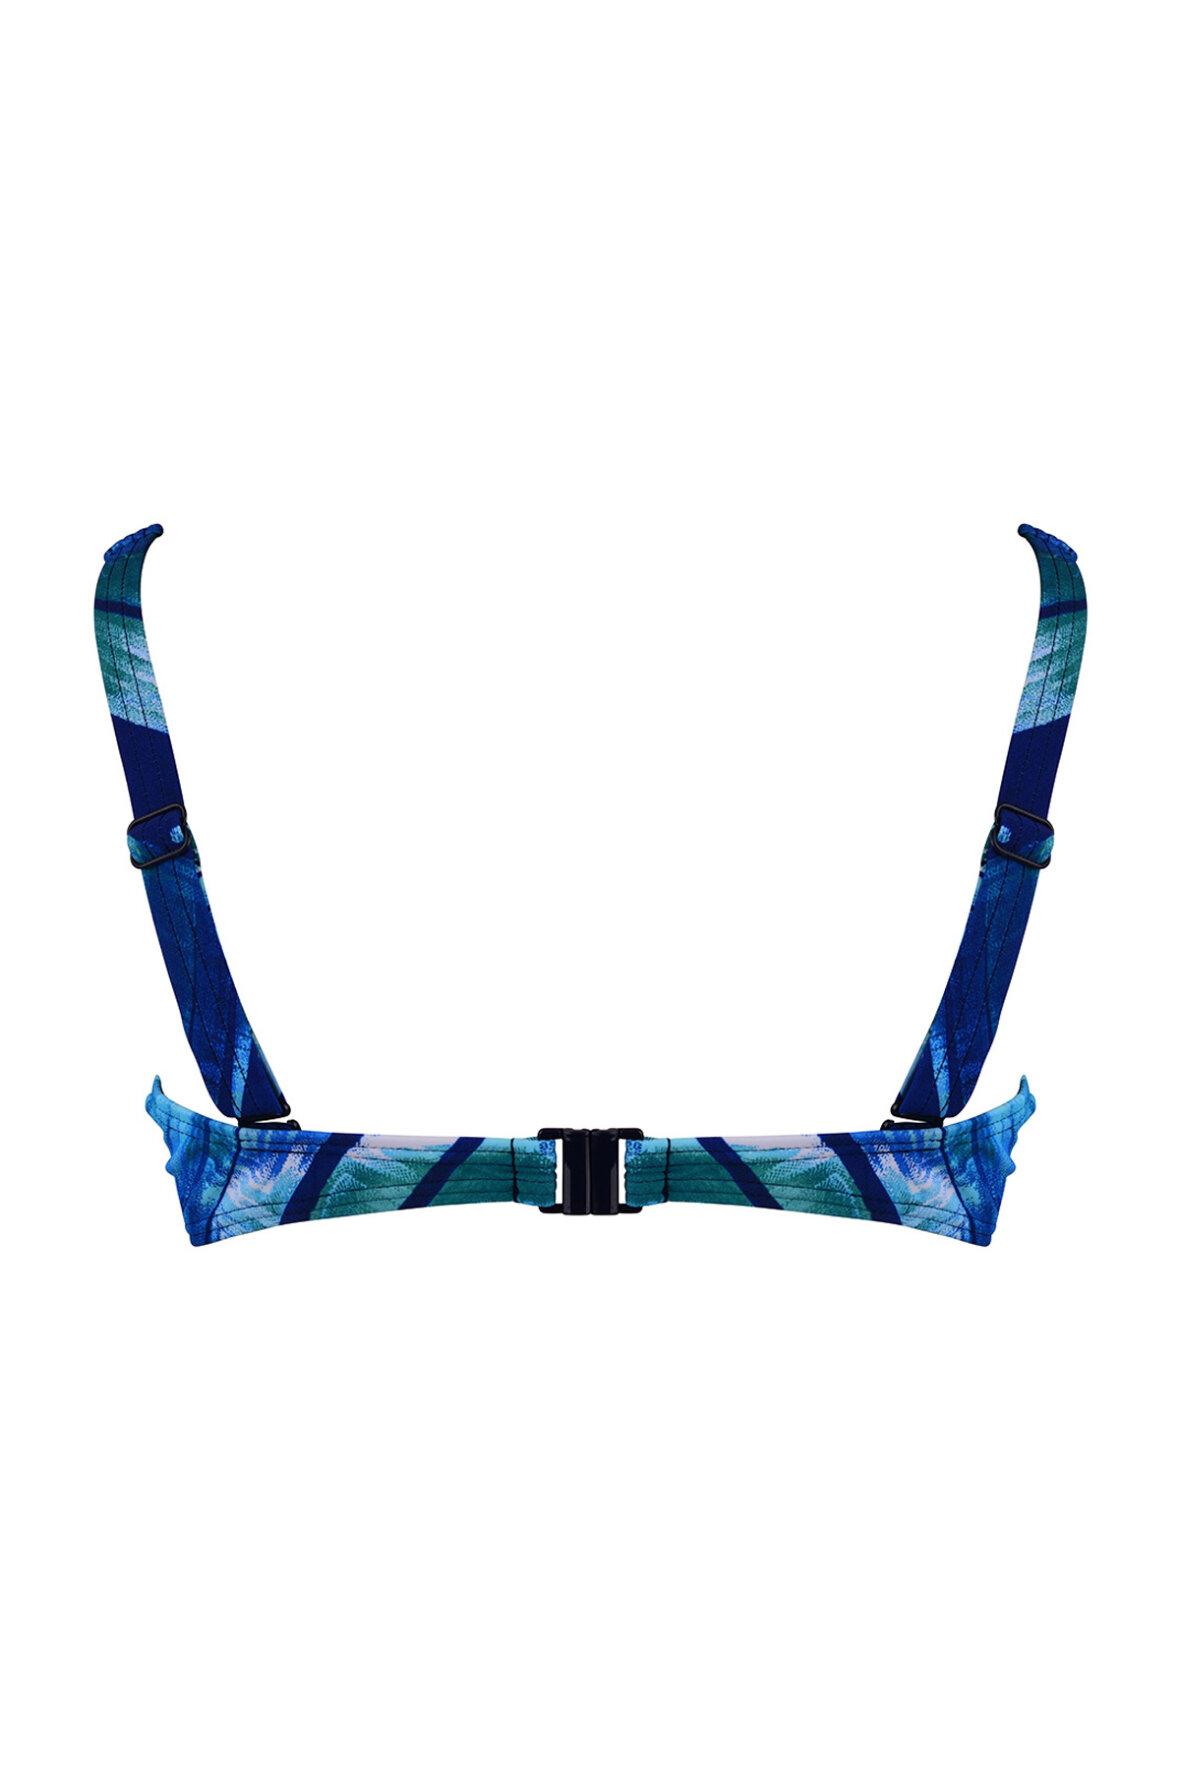 b2079e29 Naturana bikini top overdel i flot blåt og turkis tema - Hos Lohse